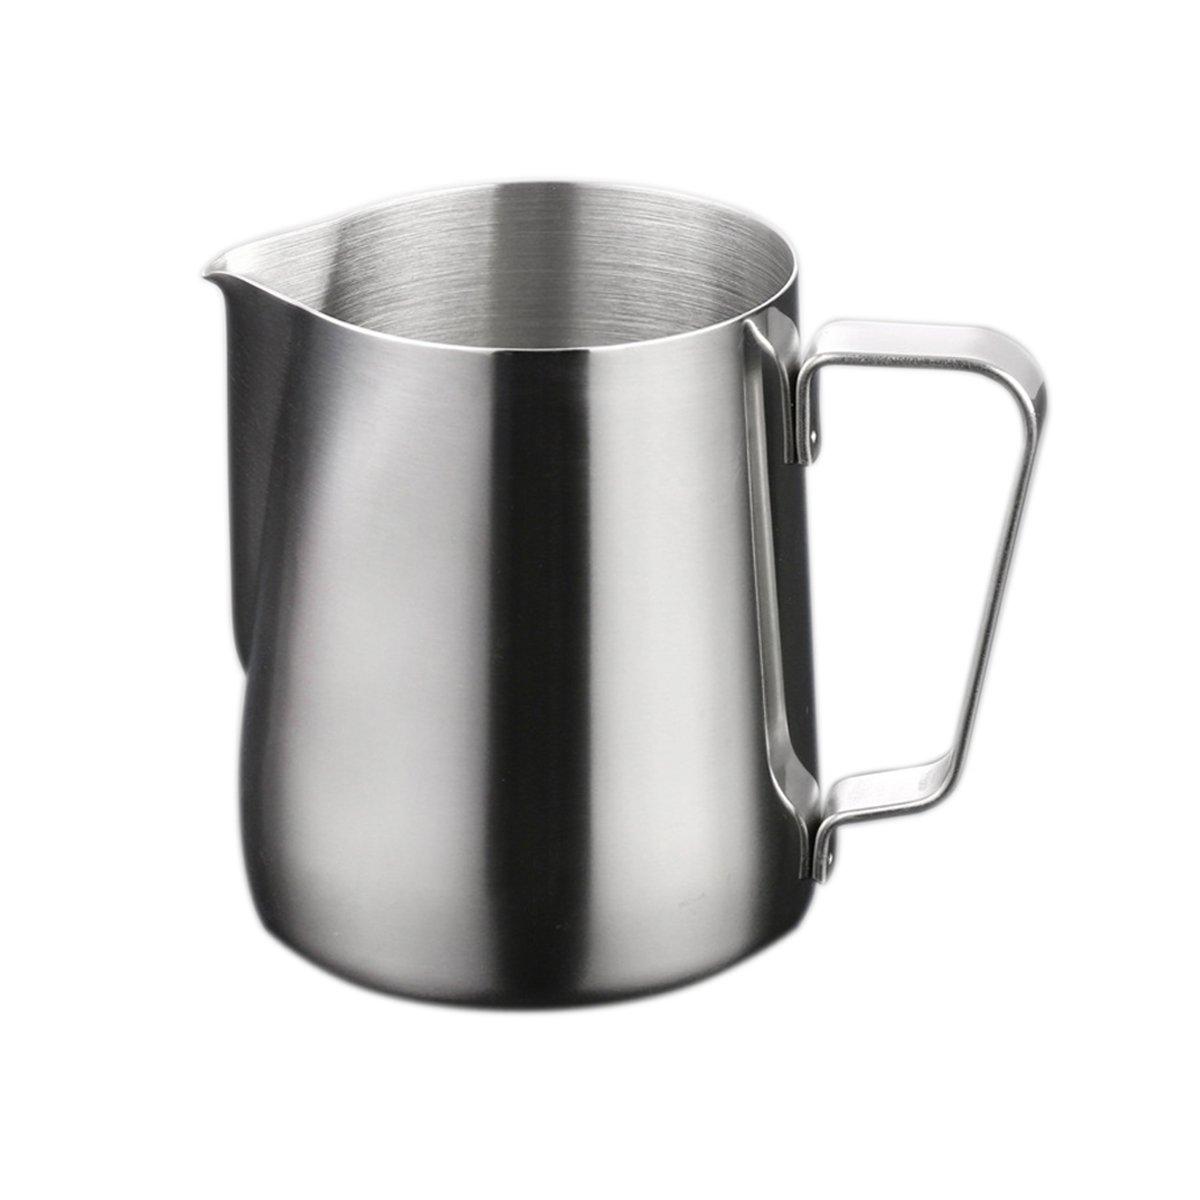 BESTONZON 150ml Stainless Steel Milk Frothing Jug Latte Pourer Cappuccino Coffee Jug